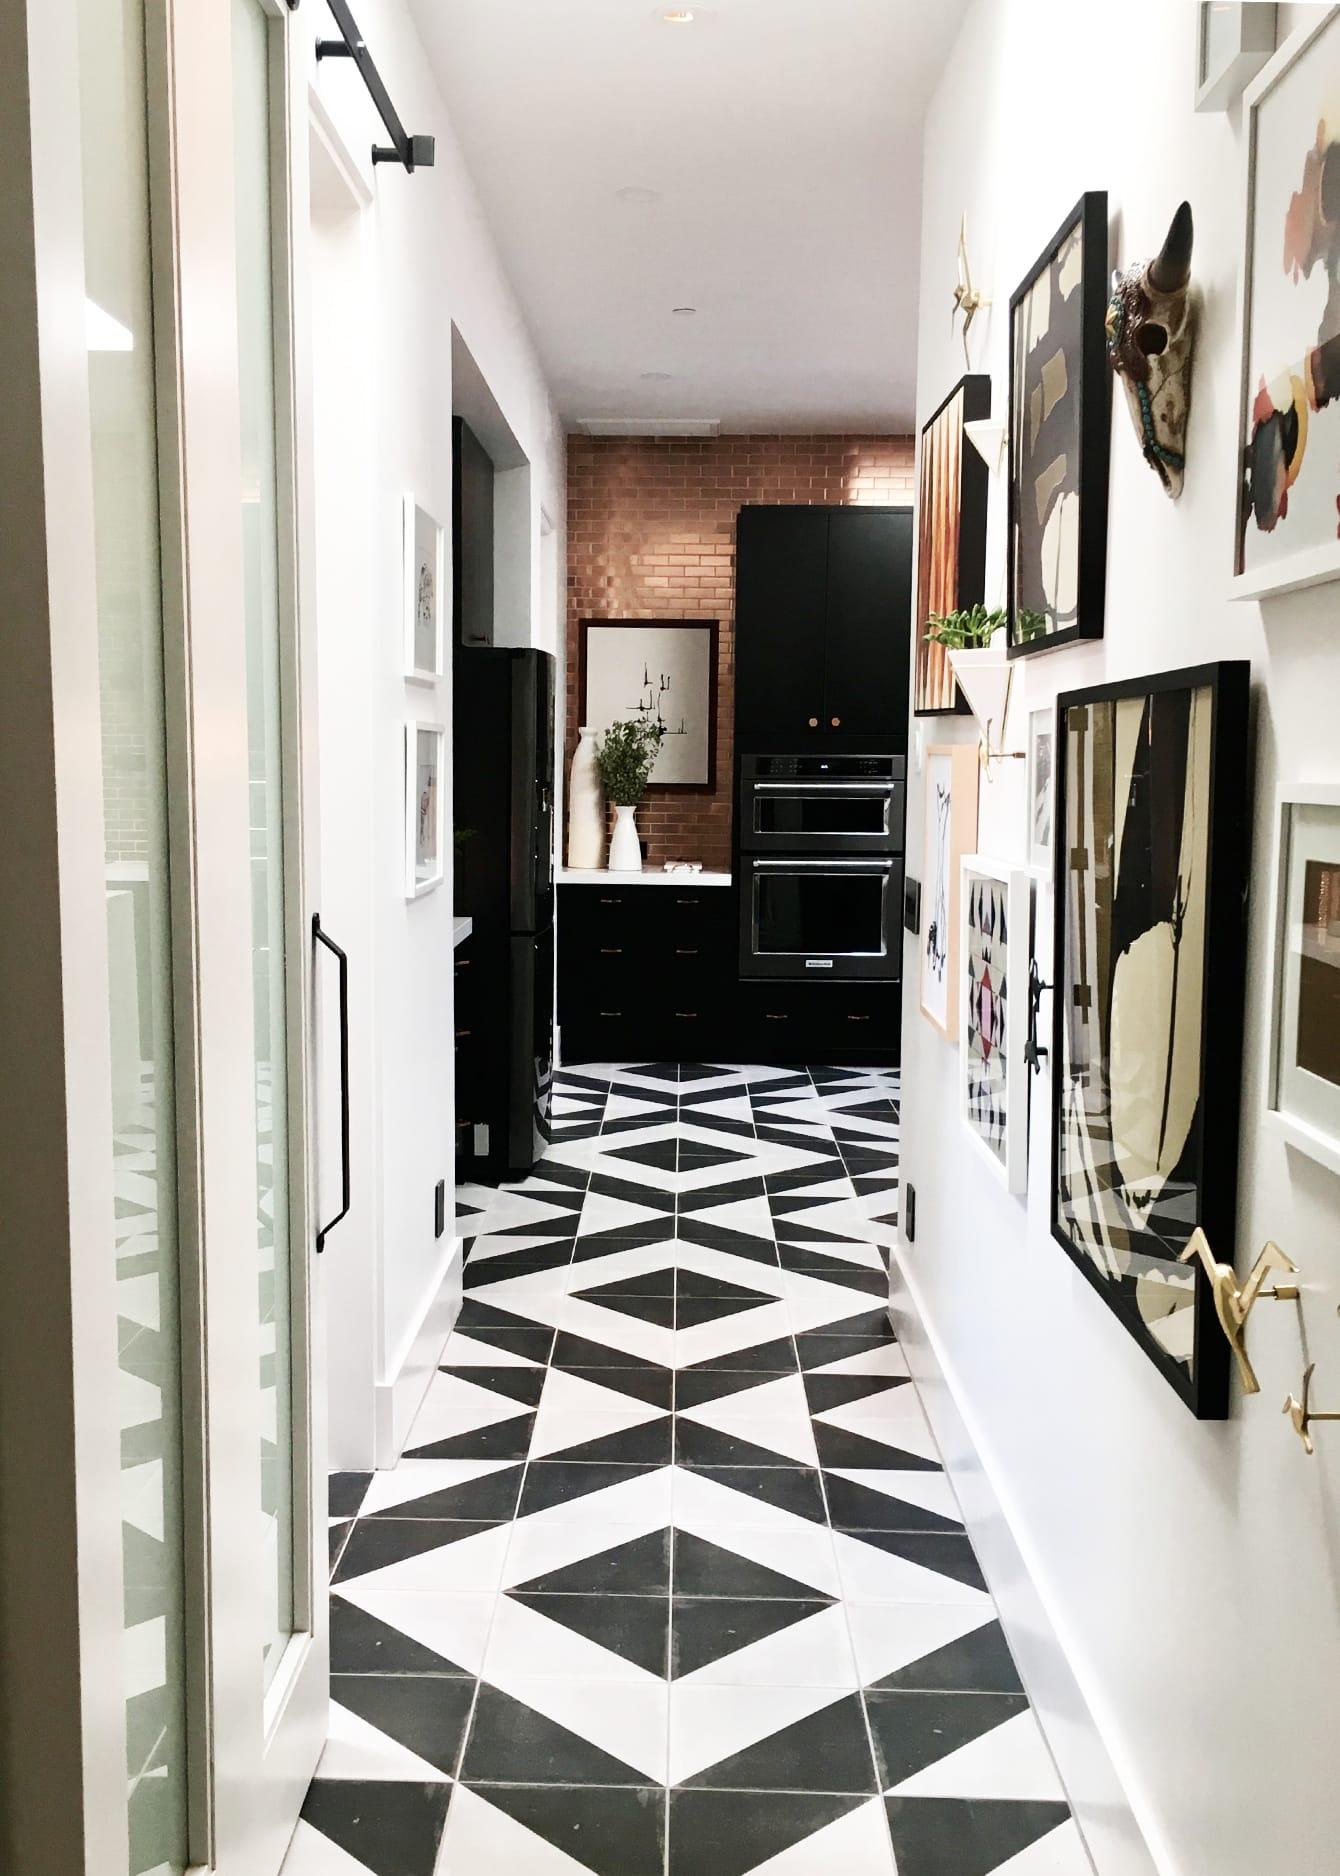 hgtv smart home tour cococozy. Black Bedroom Furniture Sets. Home Design Ideas